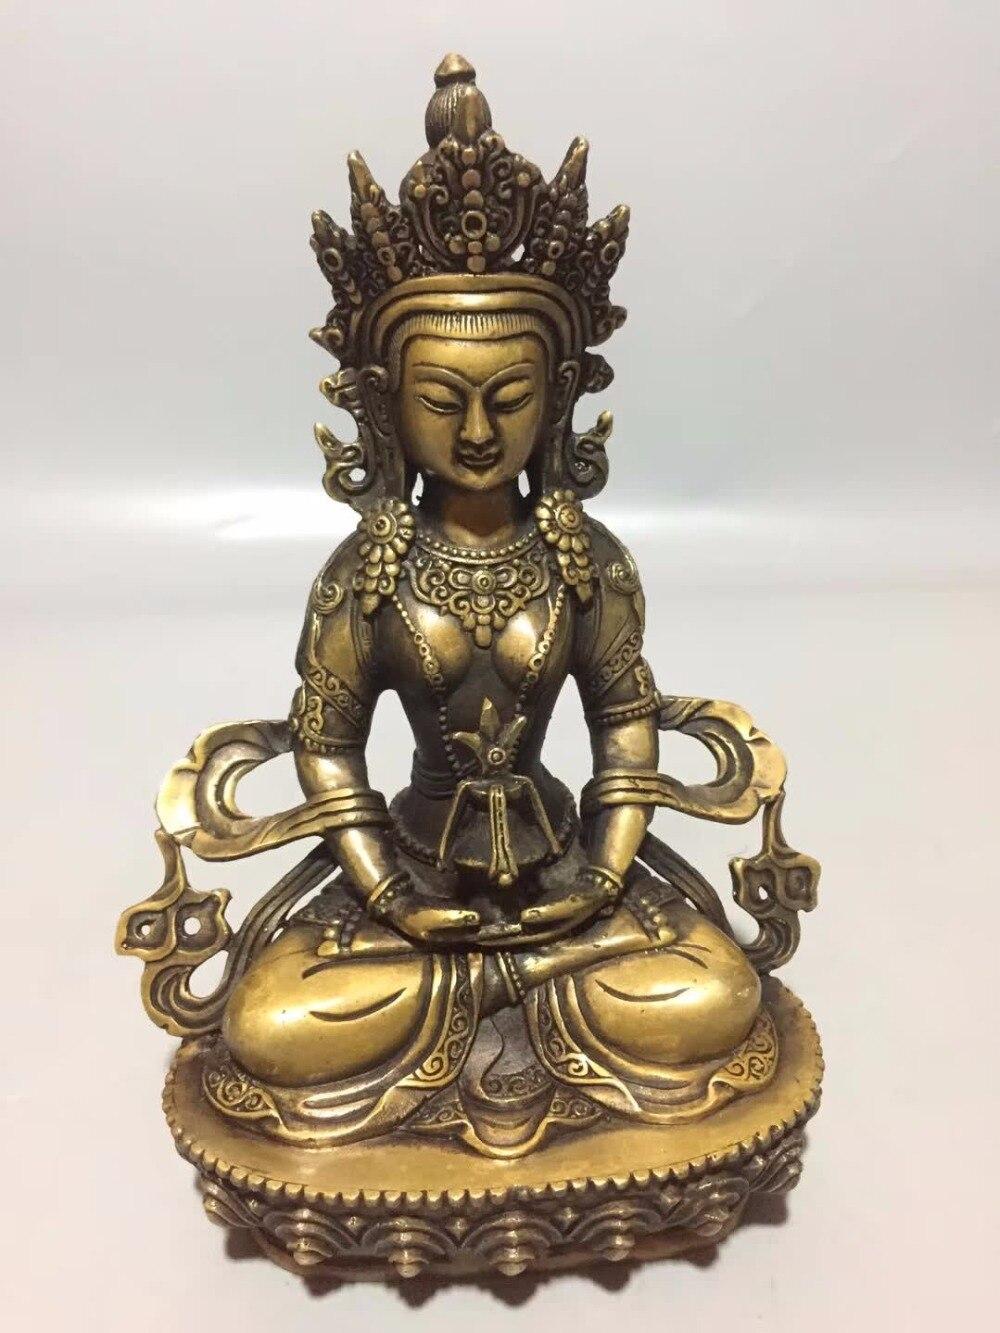 Statue de Tara faite main en Bronze tibétain de Collection d'art, décoration bouddhiste de temple de maison/bureau sculpture tibétaine de Tara